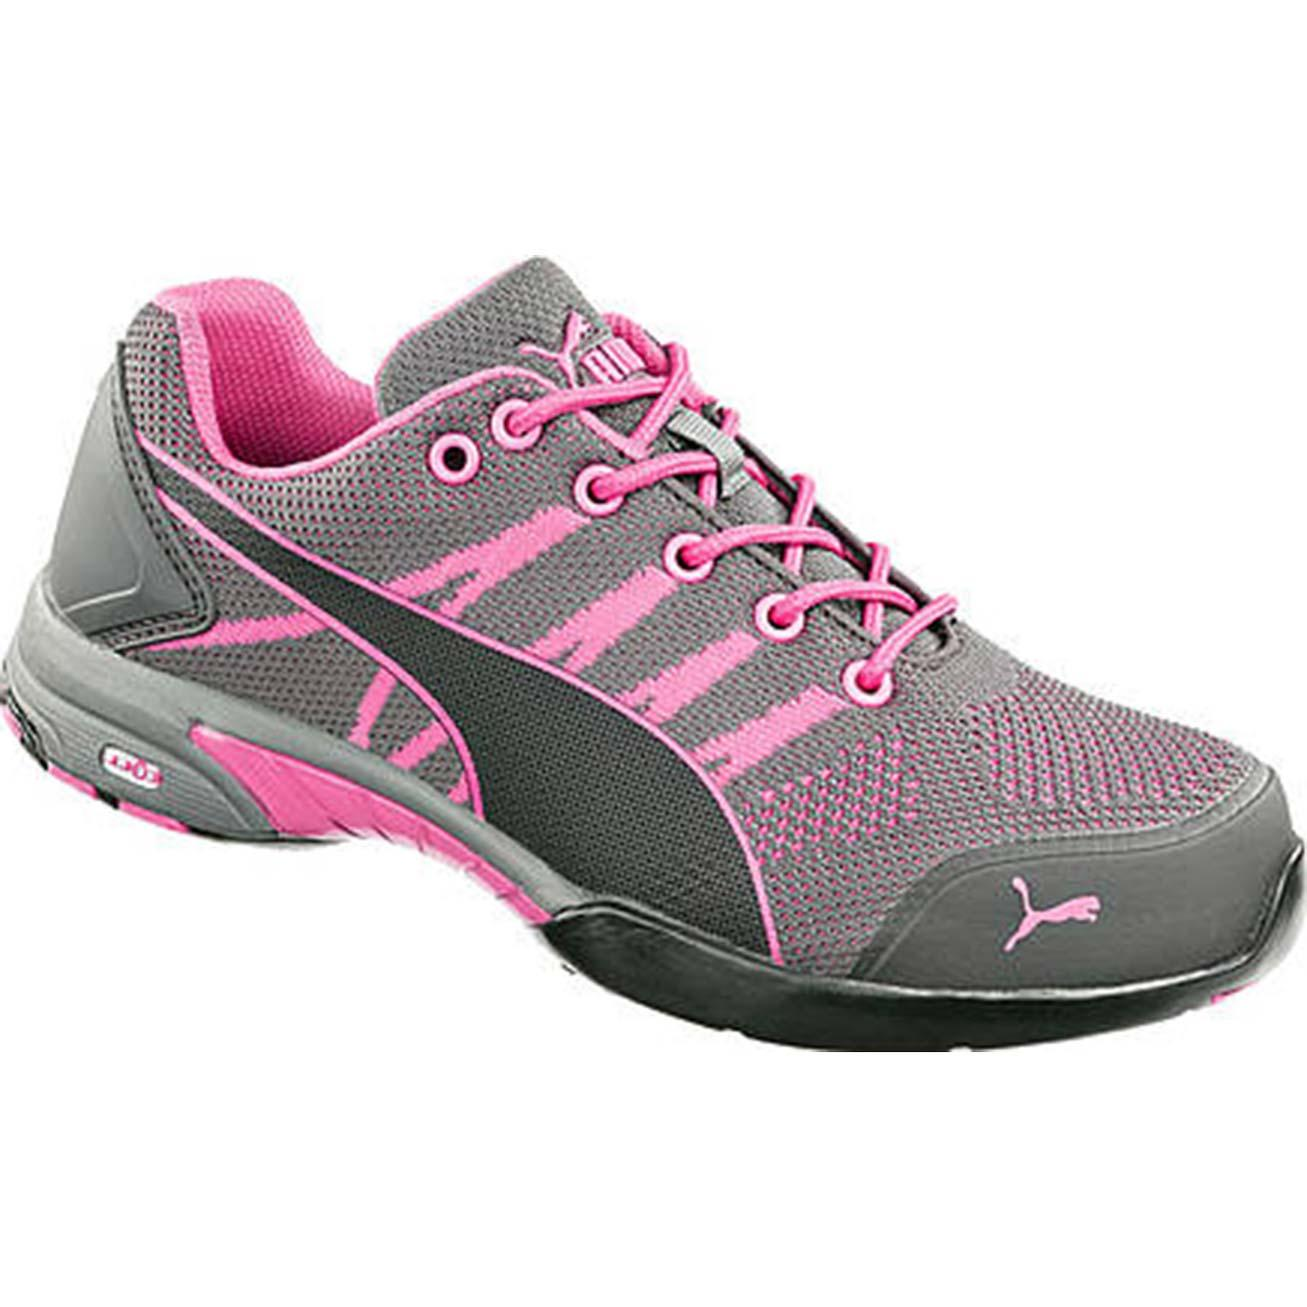 Puma Miss Safety Motion Celerity Knit Women s Steel Toe Static-Dissipative  Work Athletic Shoe d3e58fe6f